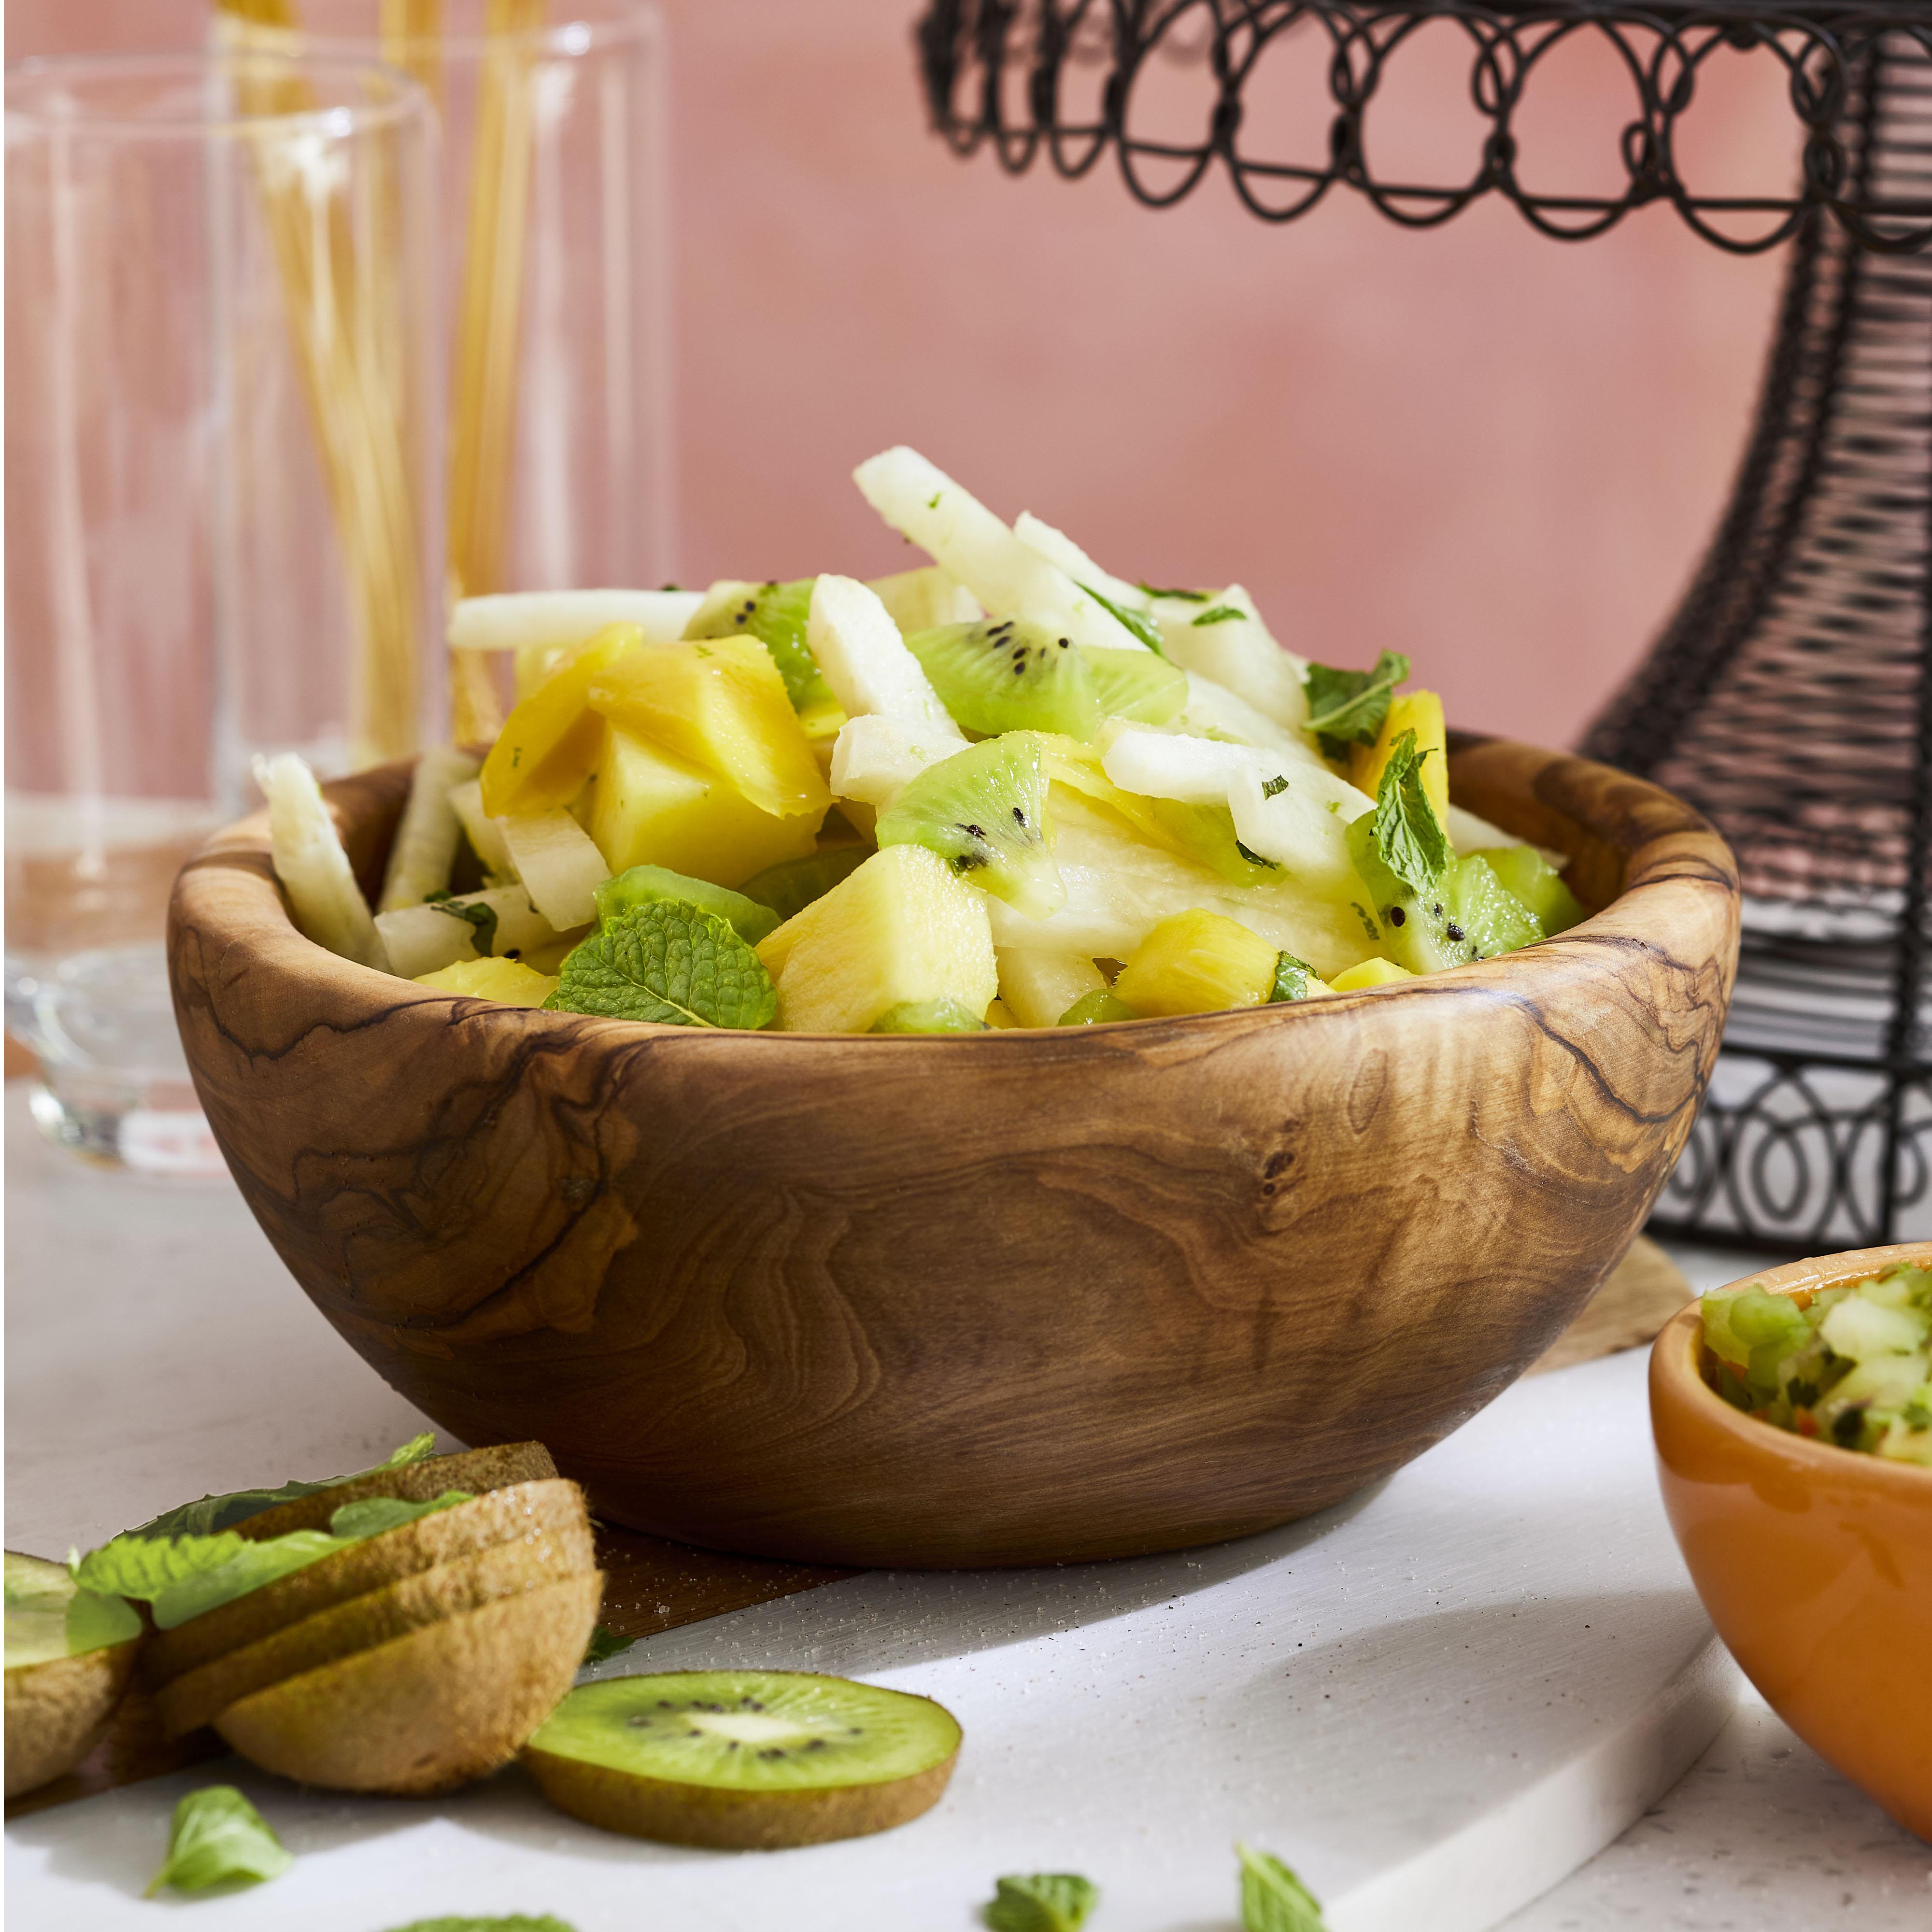 Jicama and Tropical Fruit Salad